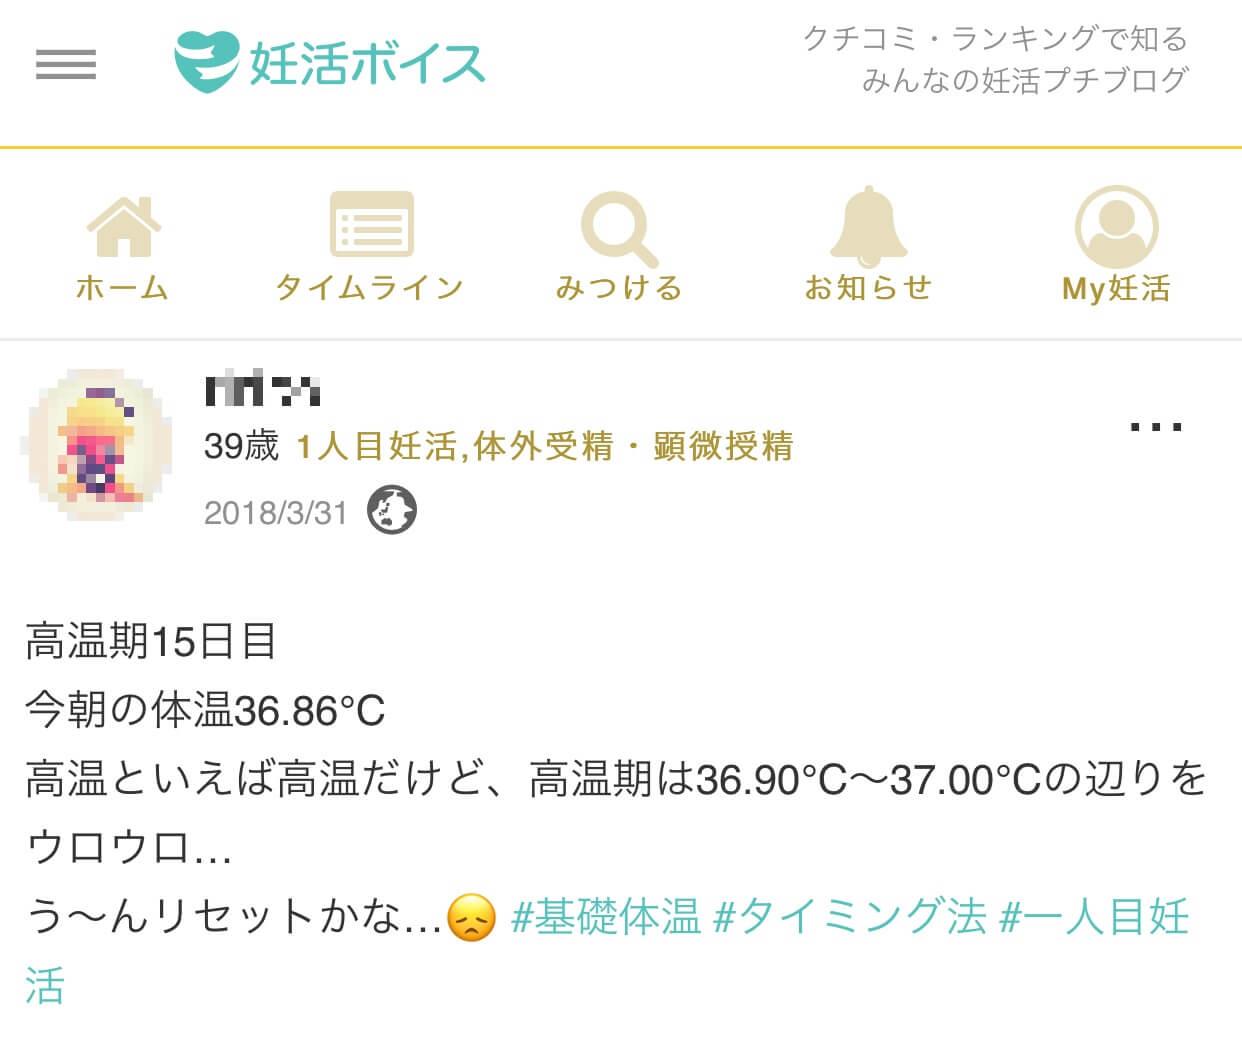 rさん(39歳・1人目妊活・体外受精・顕微授精)